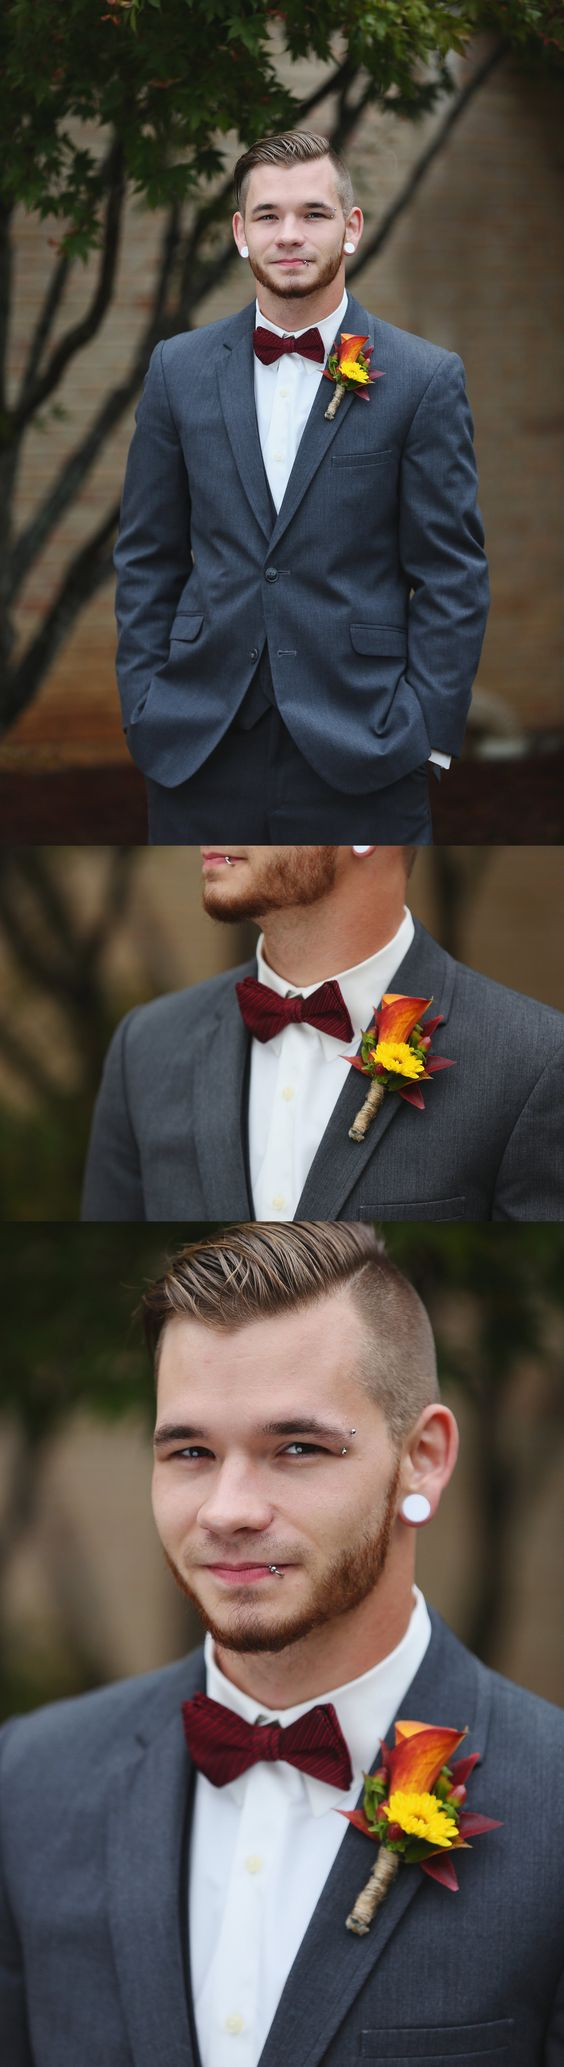 Groom Photos | Pinson Alabama Wedding | Alabama Wedding Photography | Smith Squared Photography